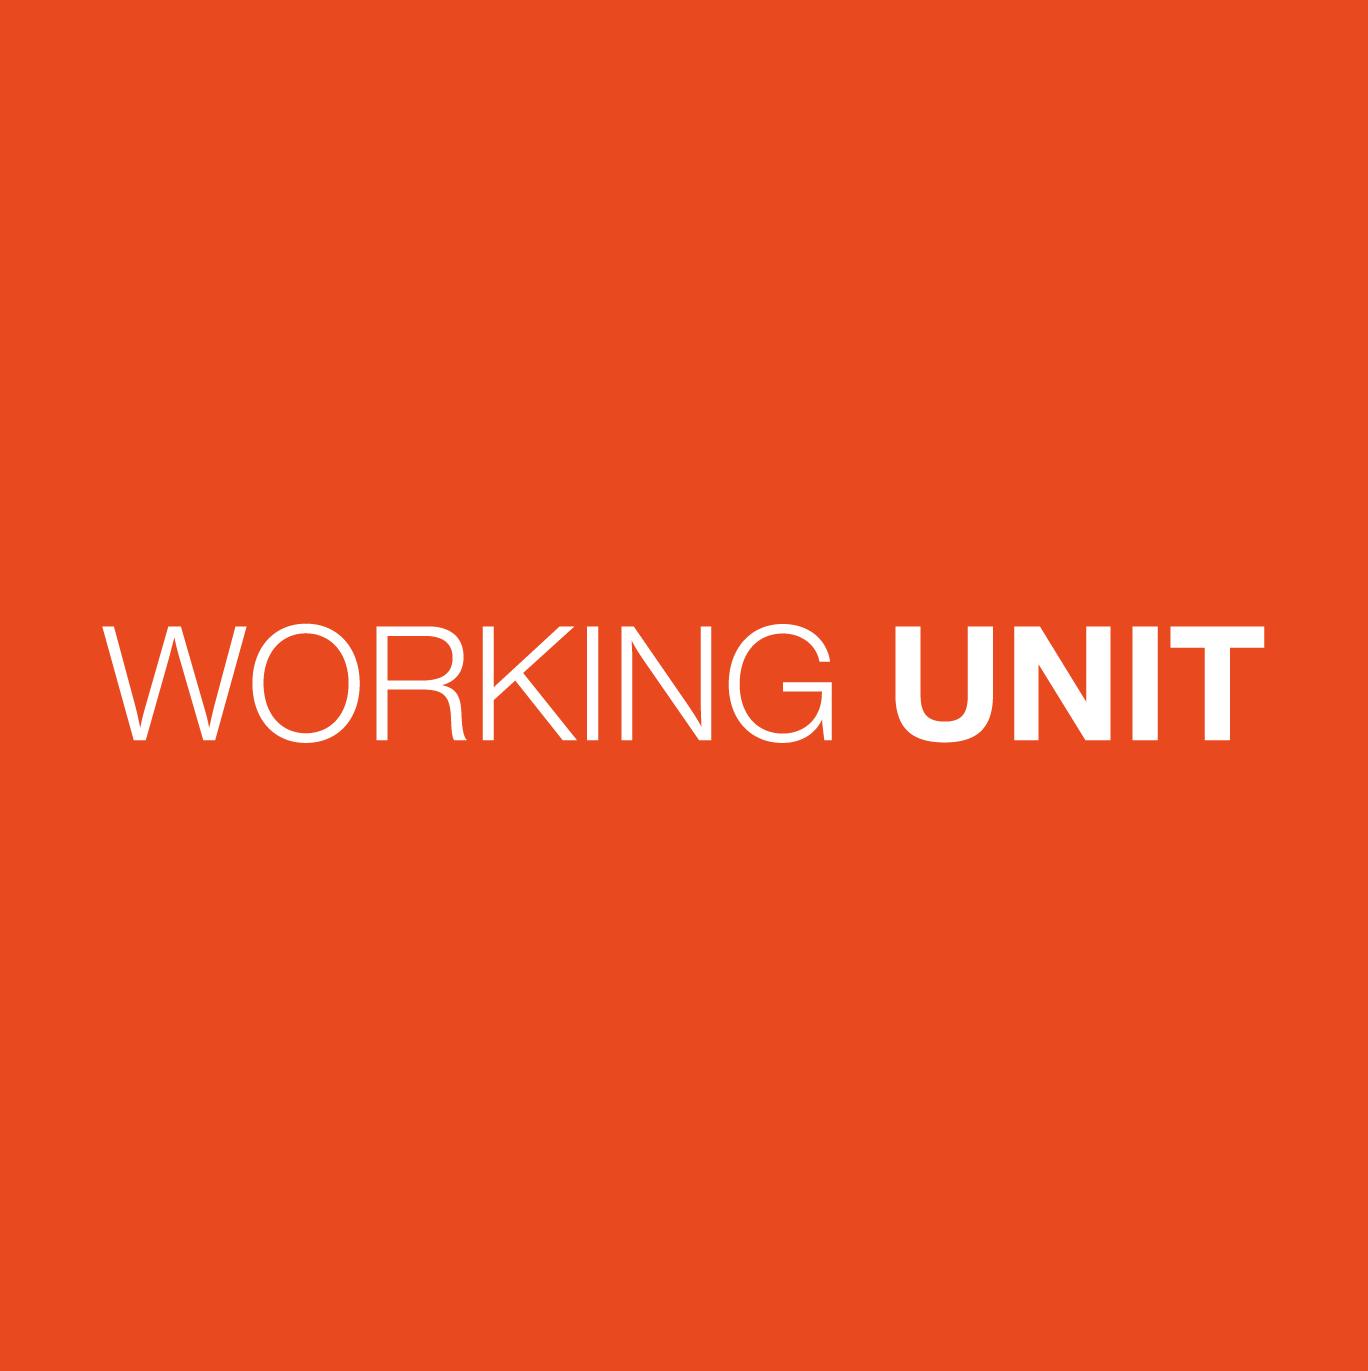 Working Unit